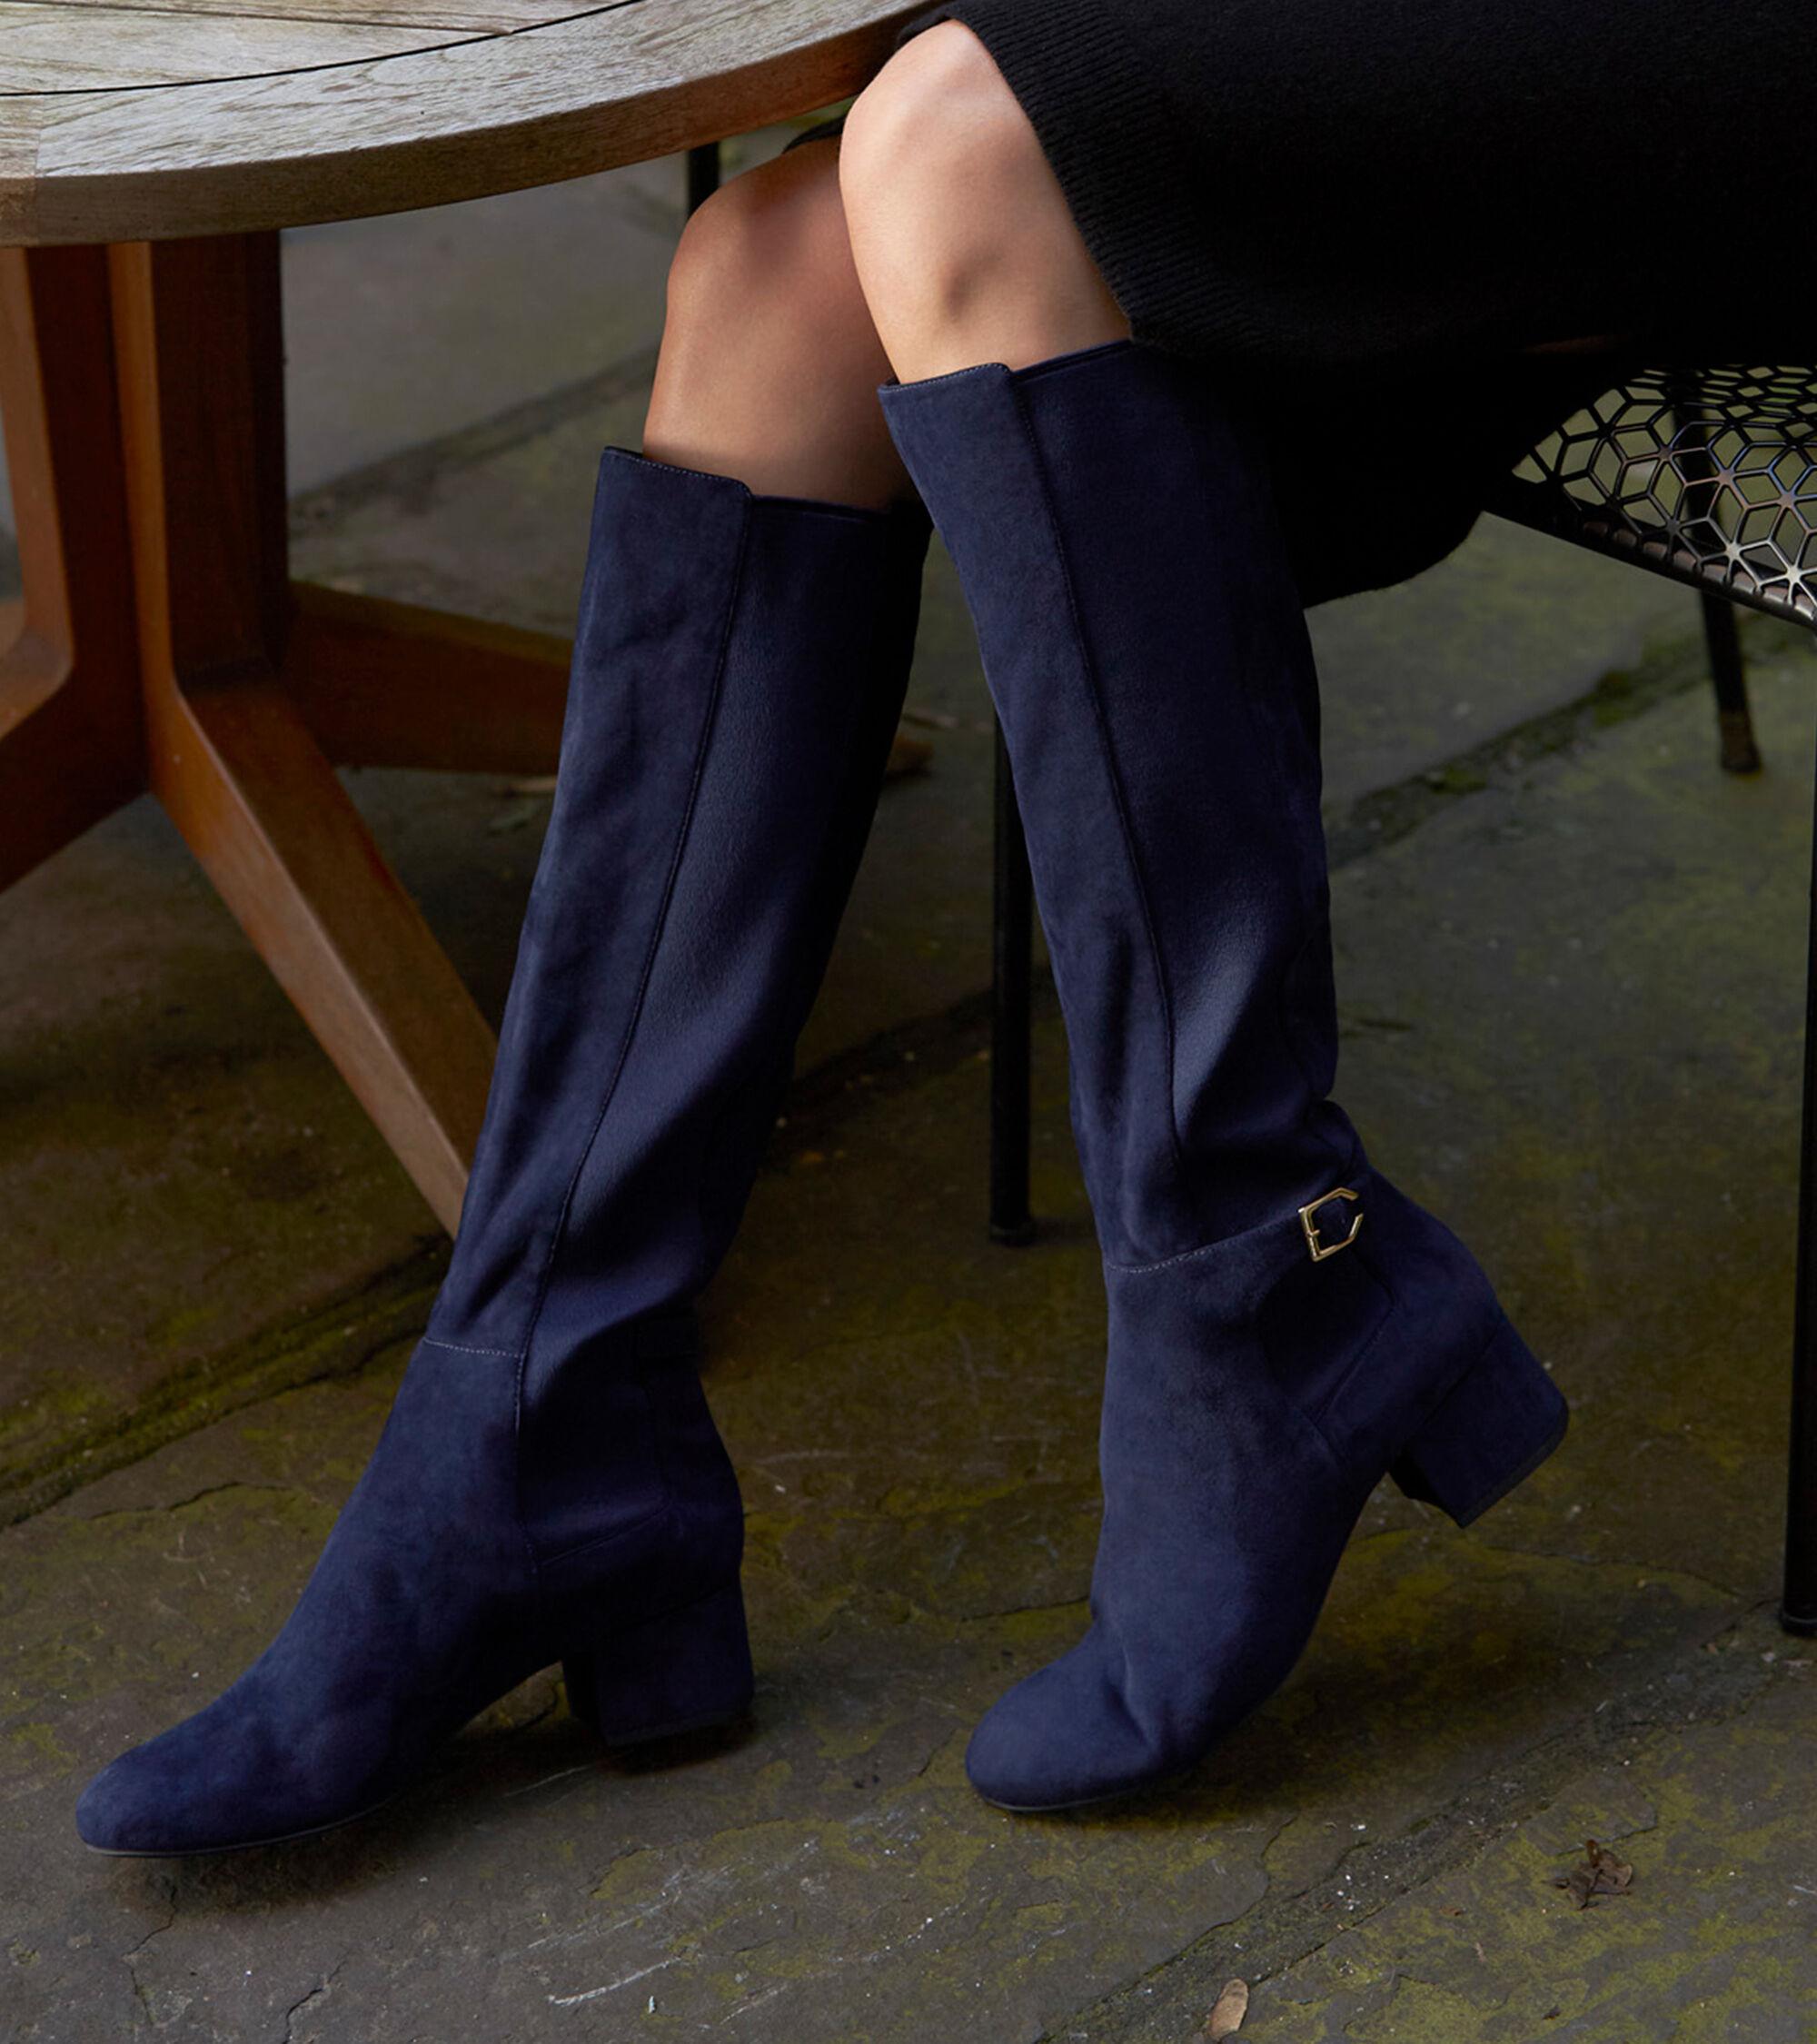 b7f8d5deafa Women s Avani Stretch Boots in Marine Blue Suede